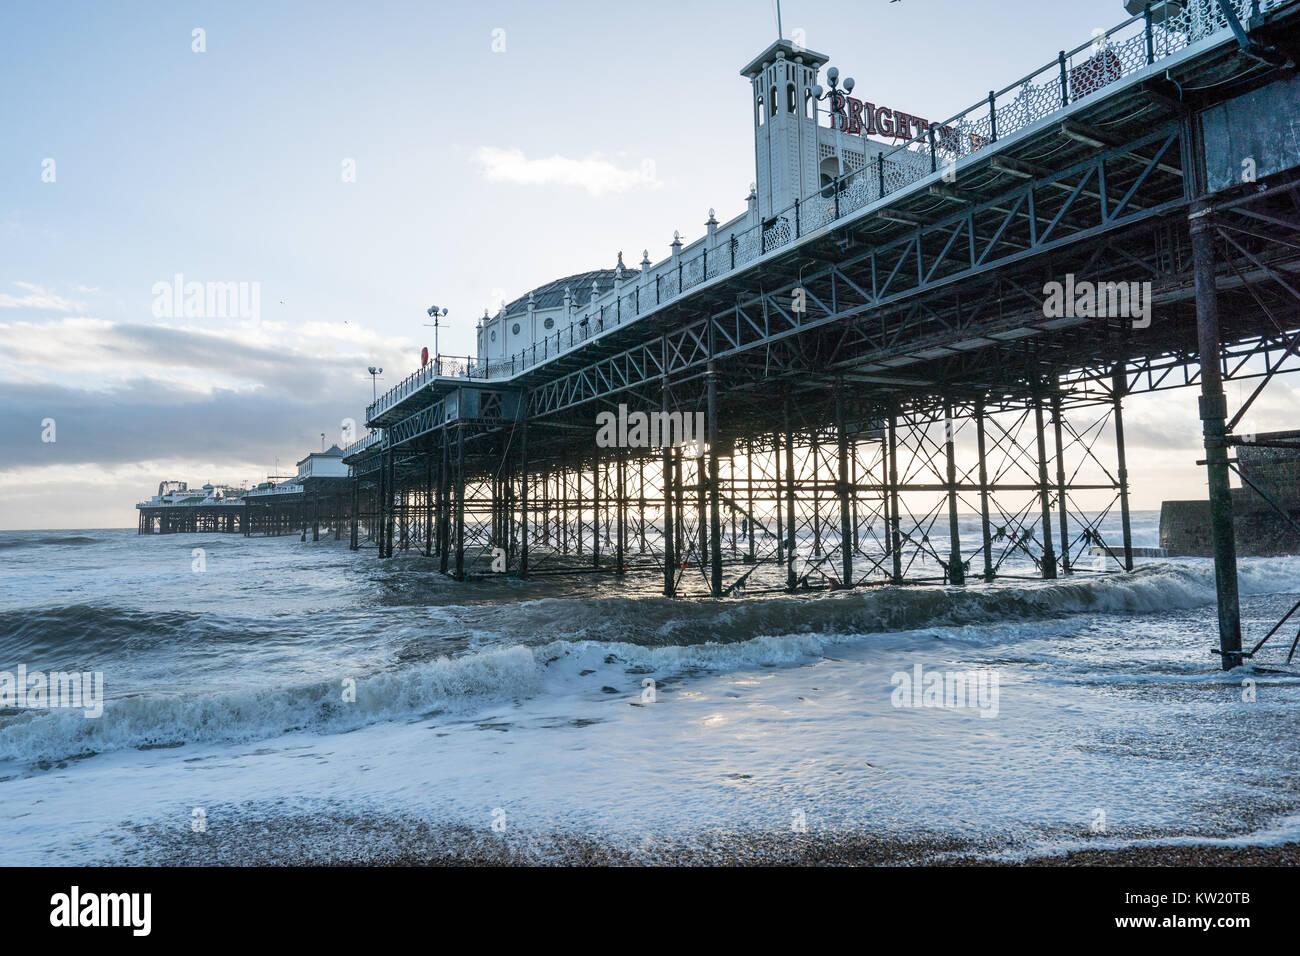 Brighton, UK. 29. Dezember, 2017. Ein Blick auf den Brighton Pier im Winter. Foto Datum: Freitag, 29. Dezember 2017. Stockbild